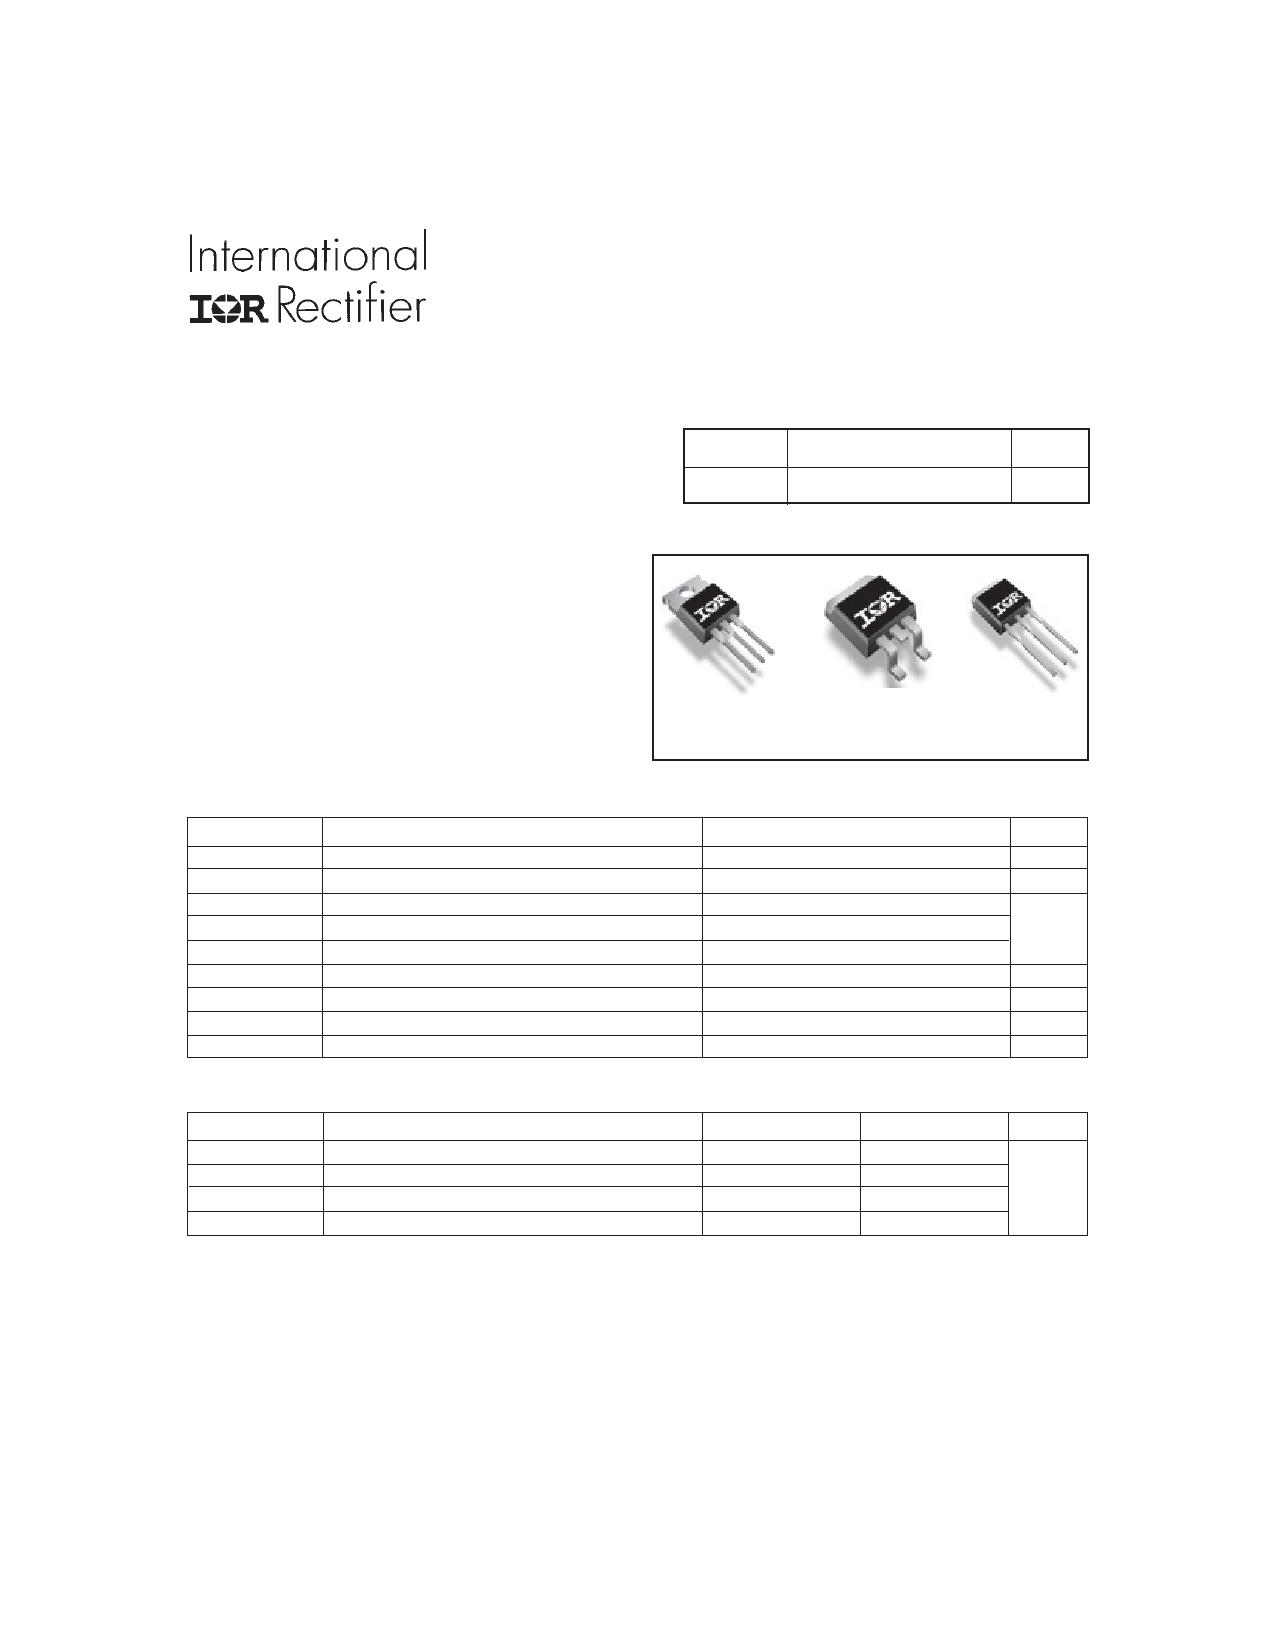 IRL3714SPbF Datasheet, IRL3714SPbF PDF,ピン配置, 機能